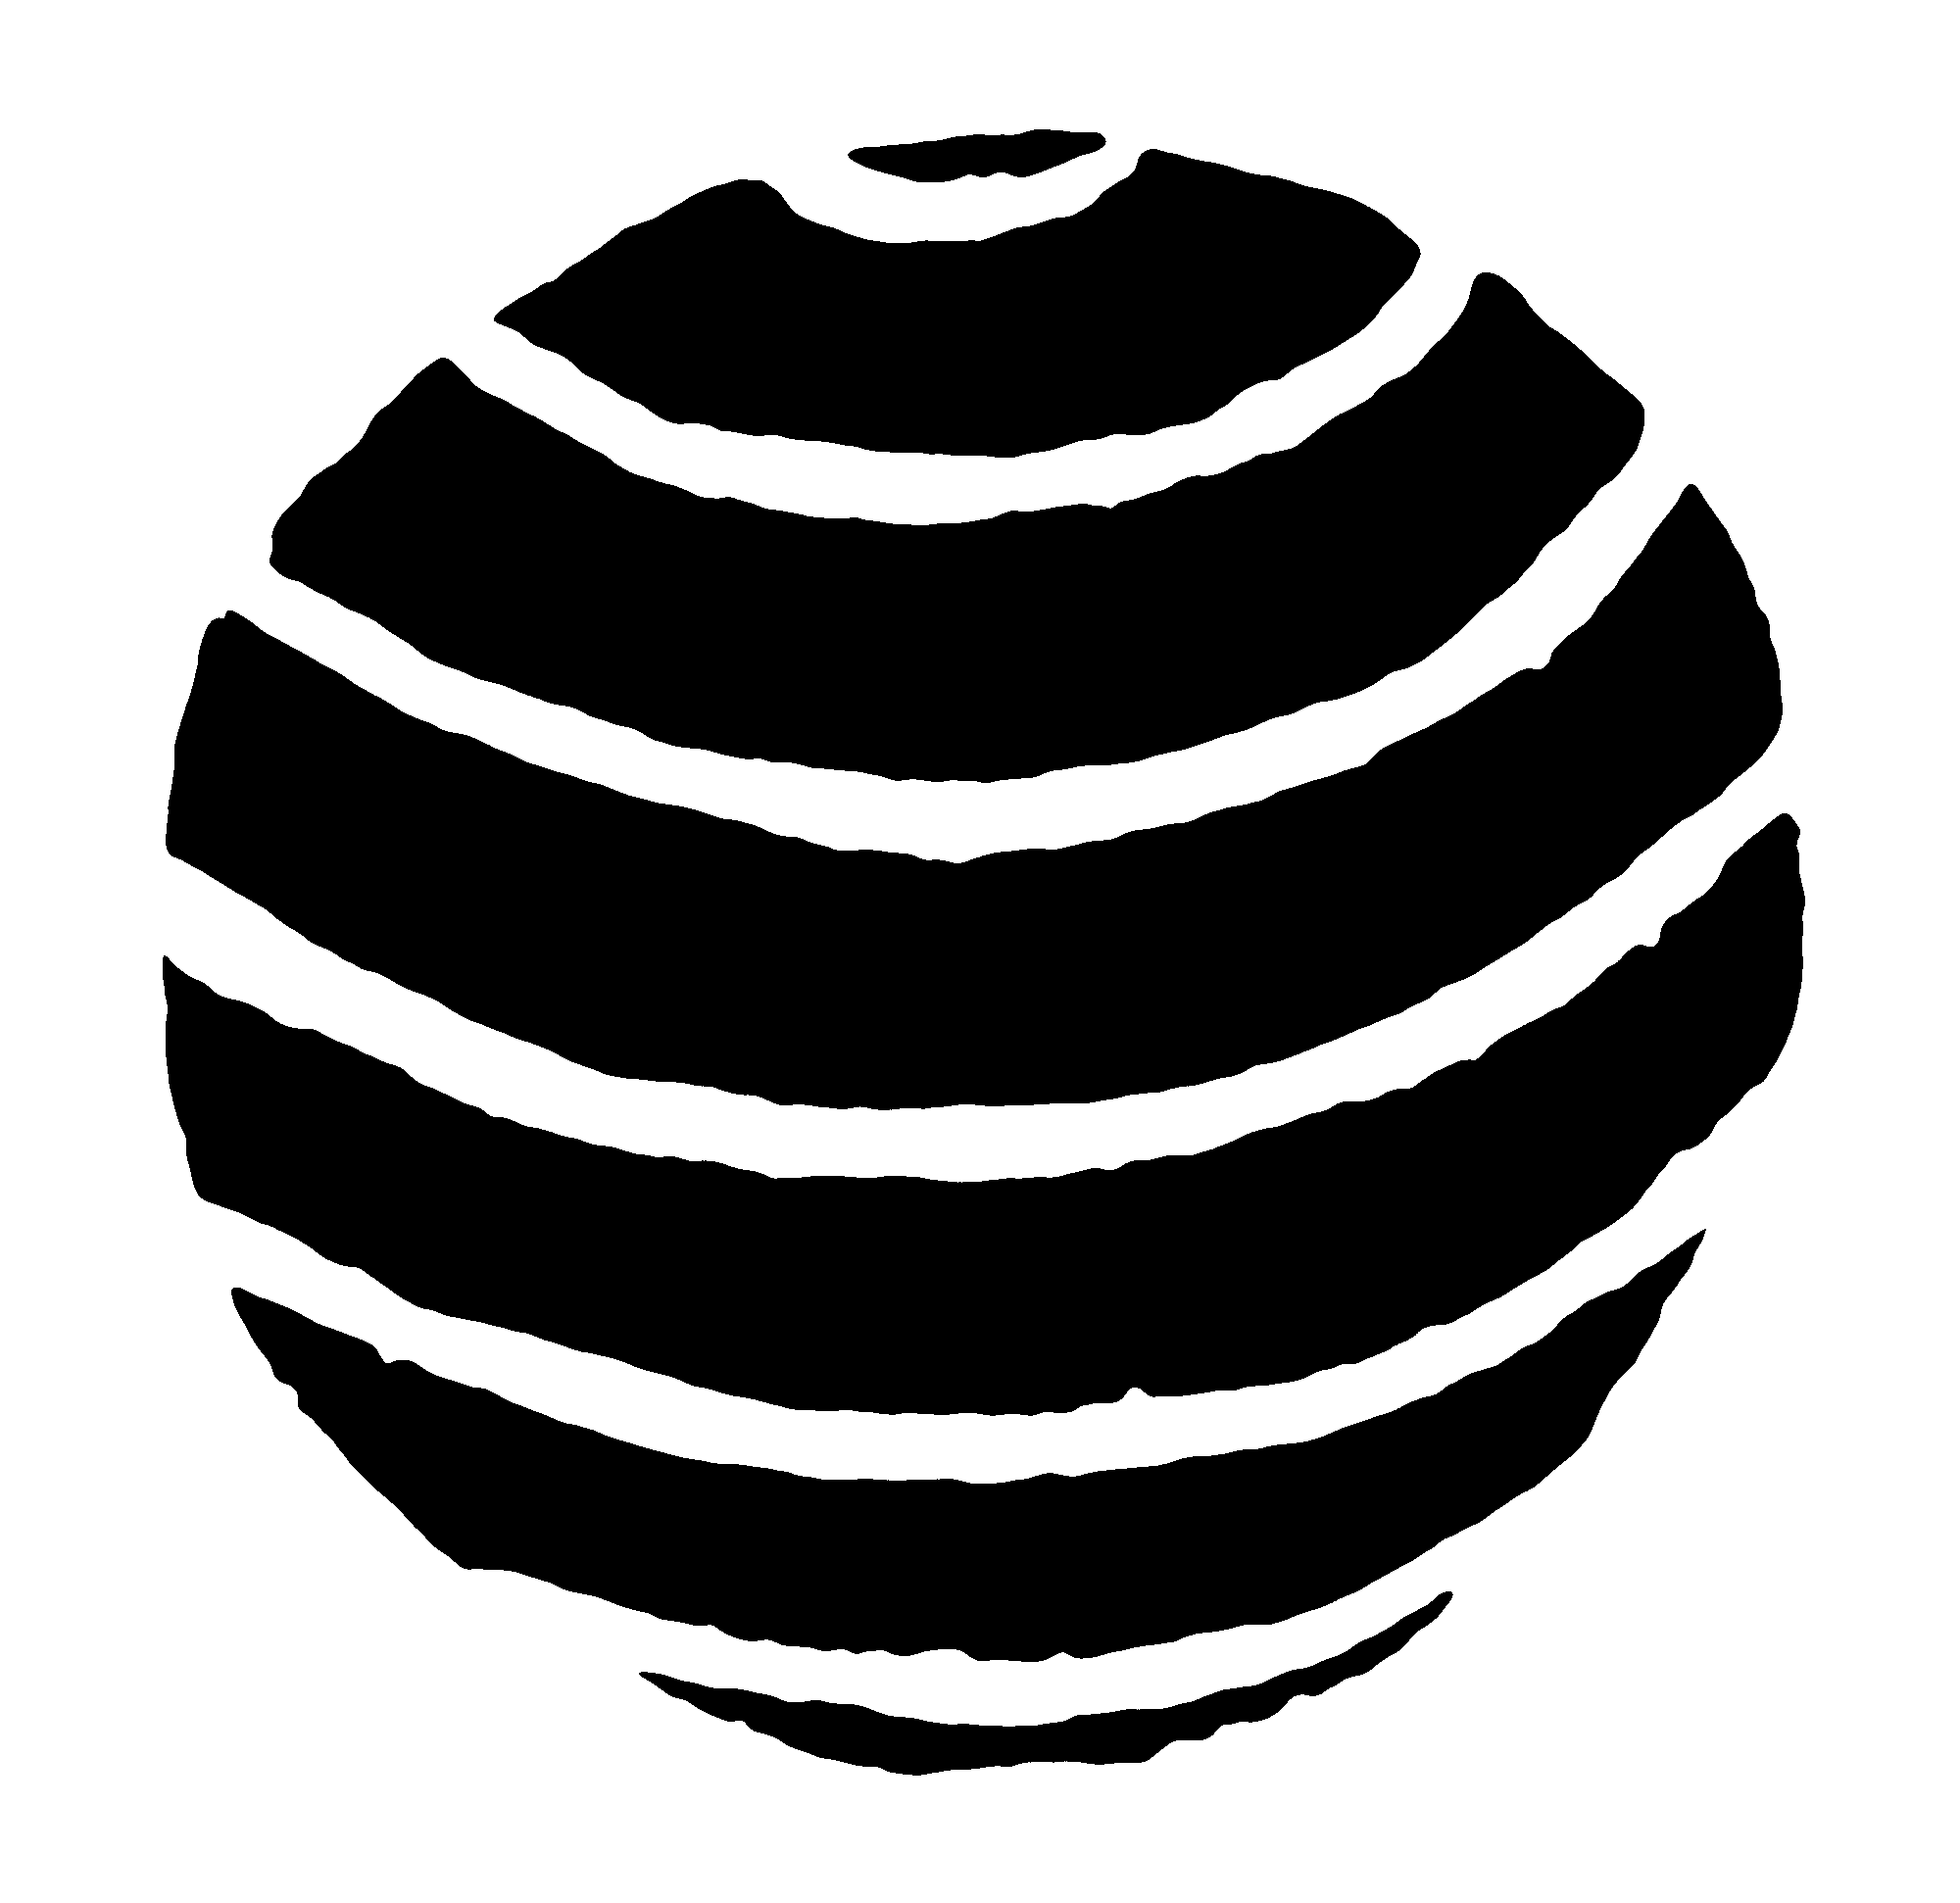 visual-language/img/animation/back/illich-conviviality.png